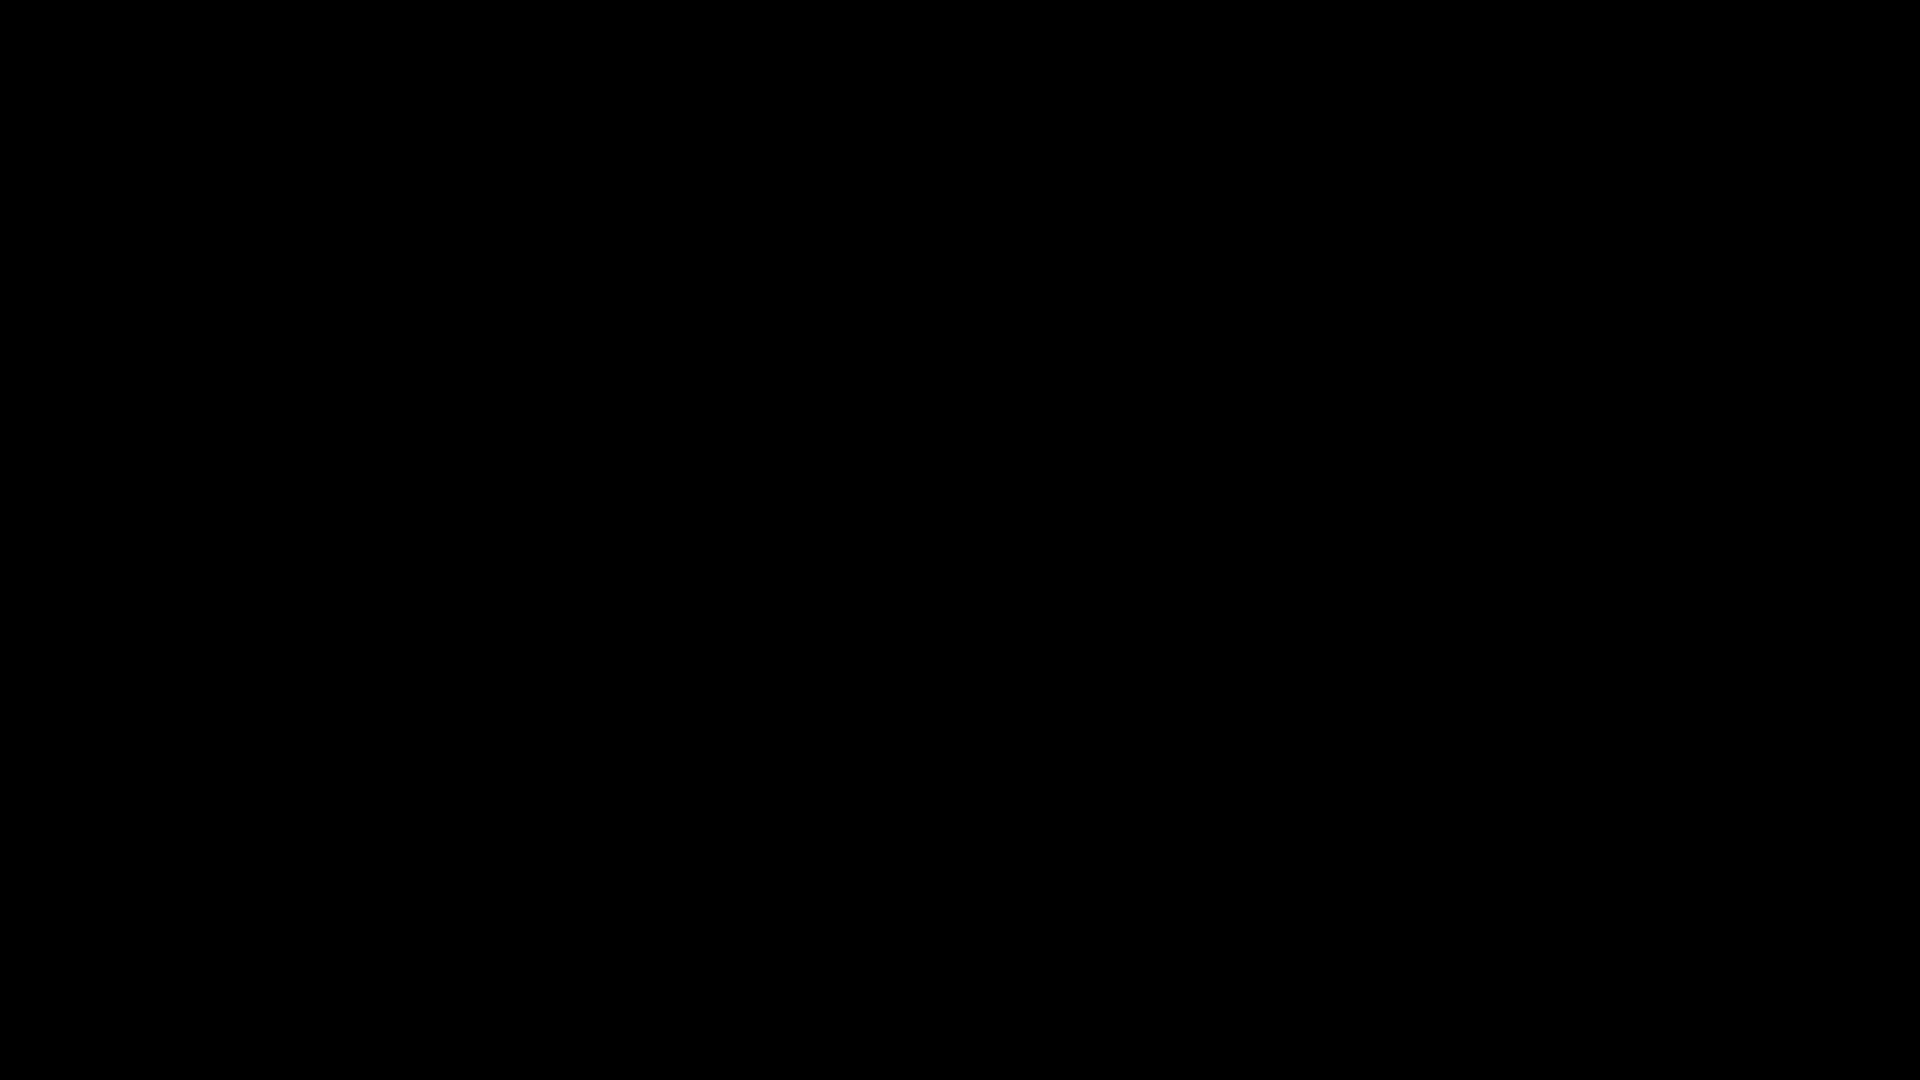 planetside2, Planetside 2 2018.09.16 - 01.30.32.04.DVR GIFs